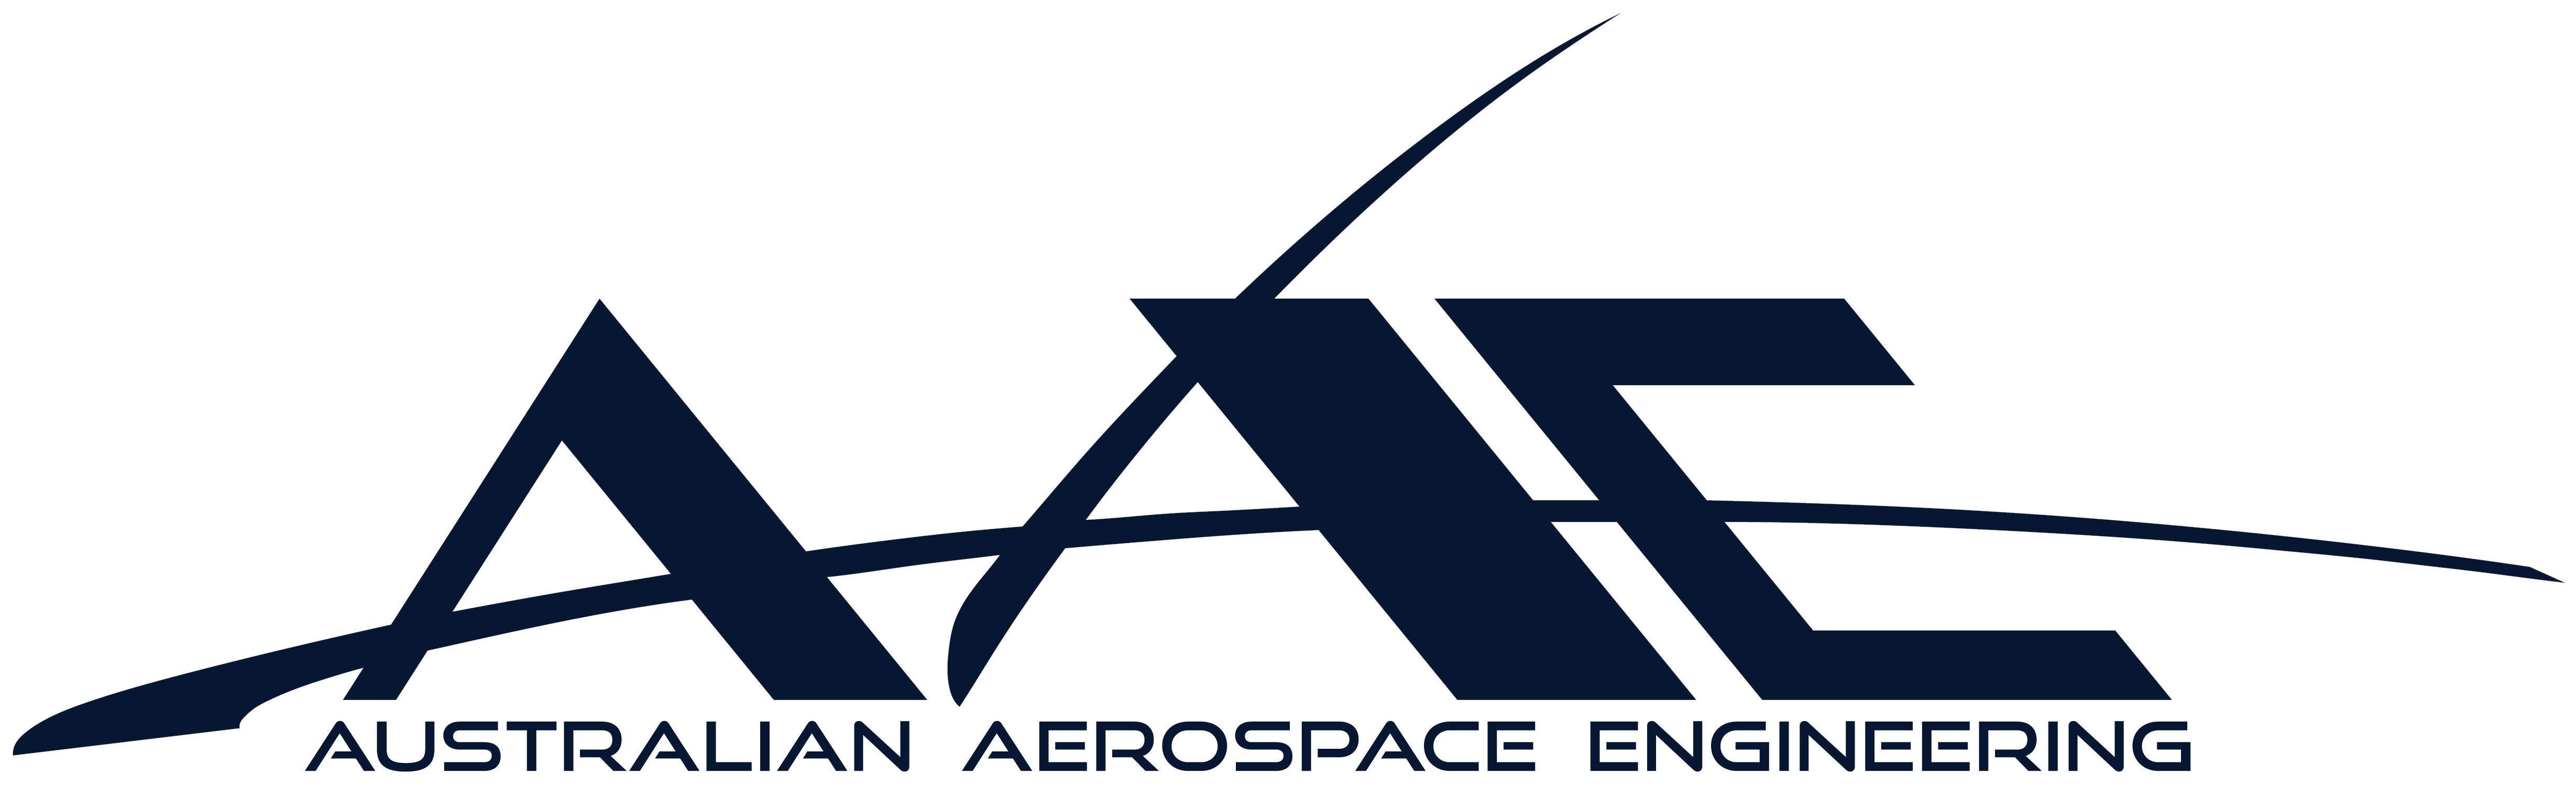 Australian Aerospace Engineering Pty Ltd